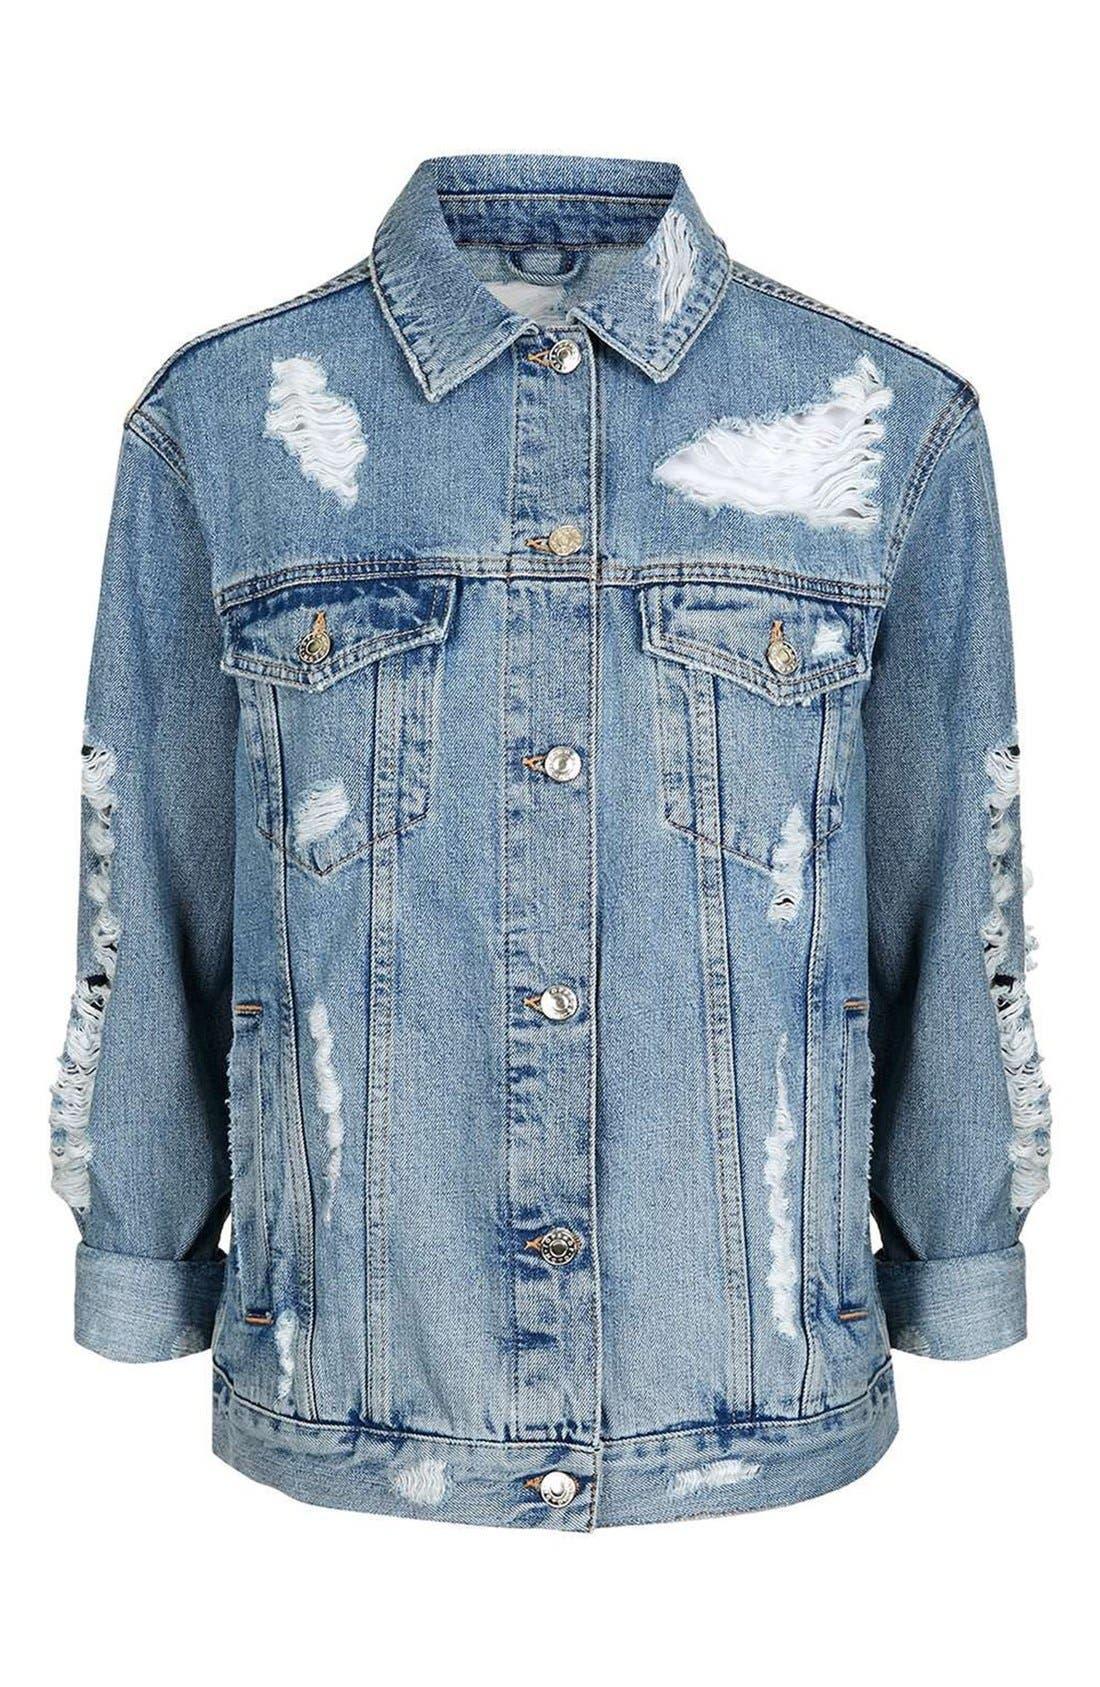 Alternate Image 3  - Topshop Ripped Oversize Denim Jacket